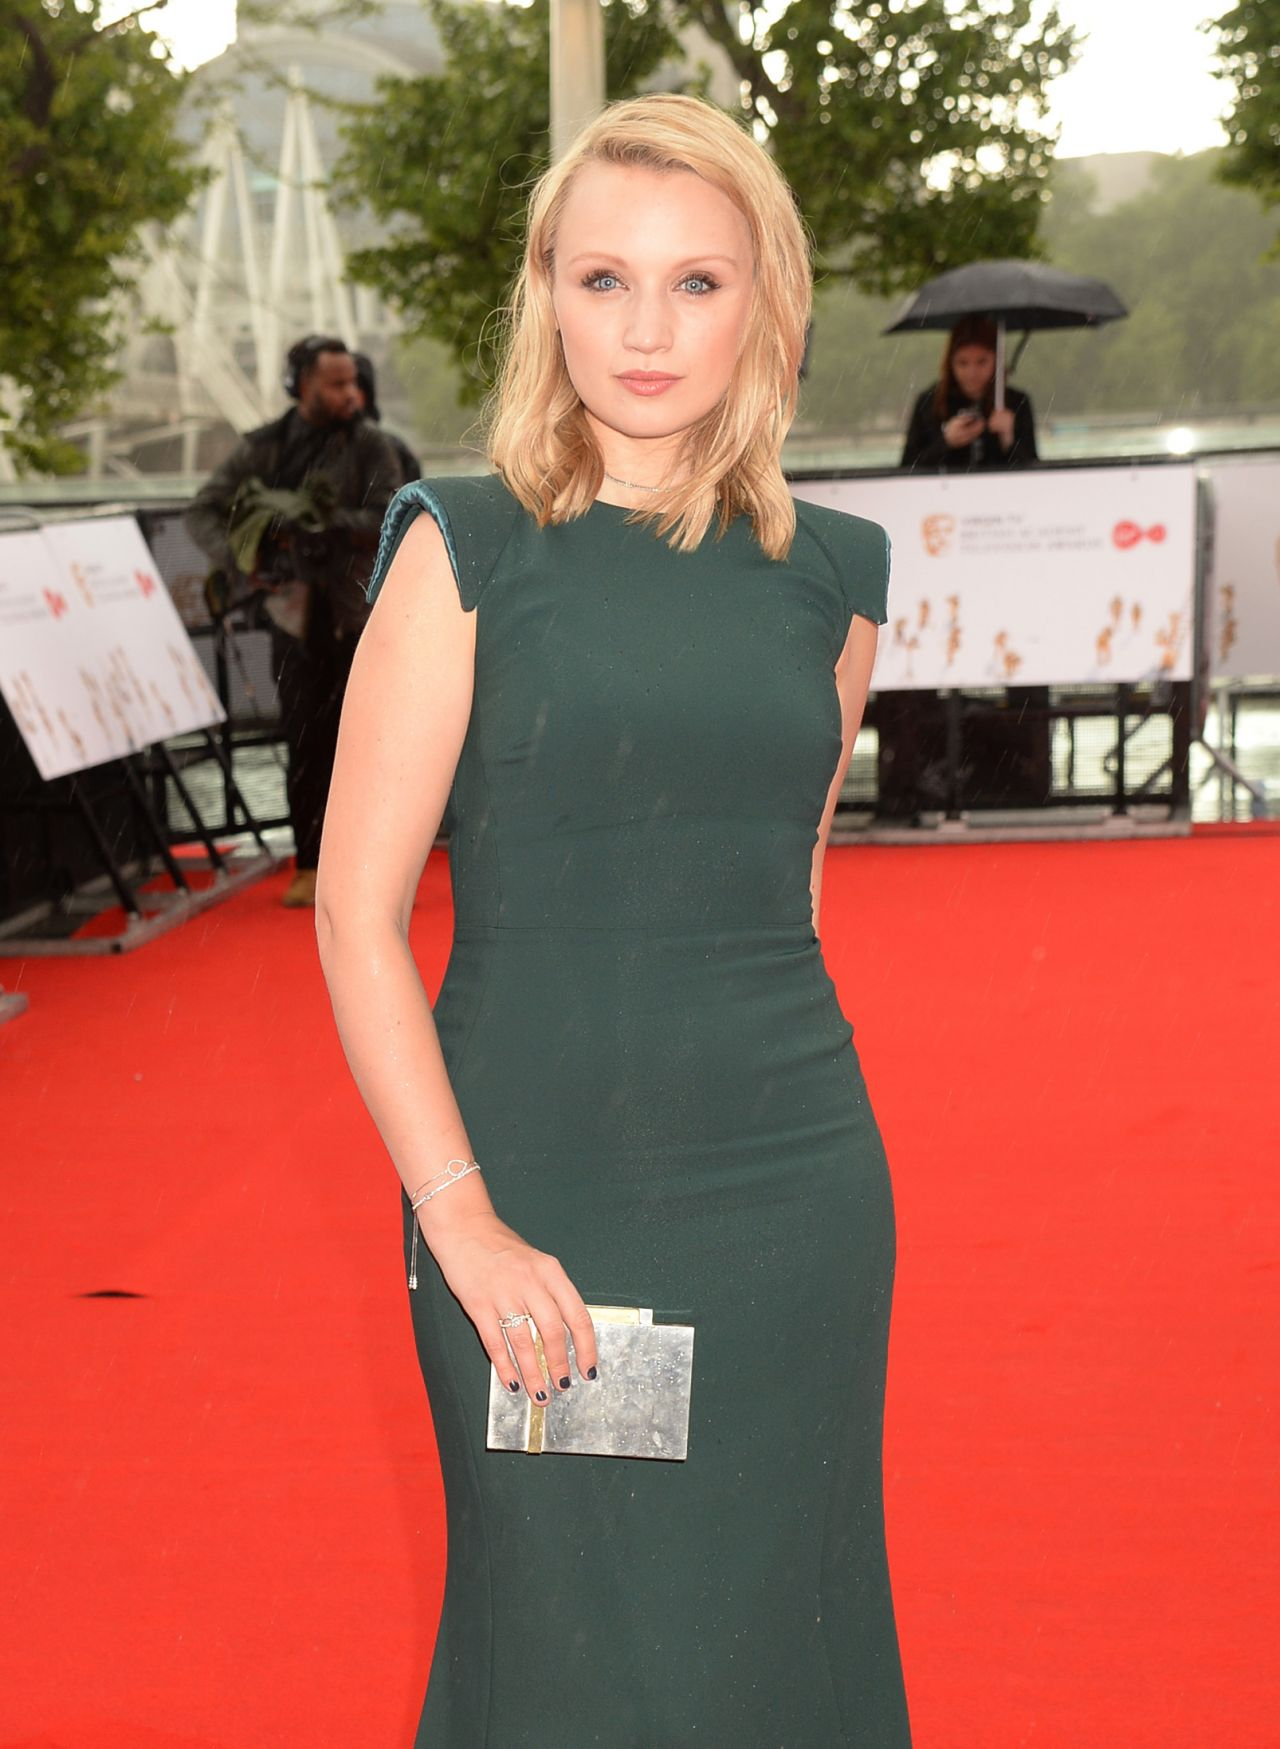 Emily Berrington Bafta Tv Awards In London 05 14 2017